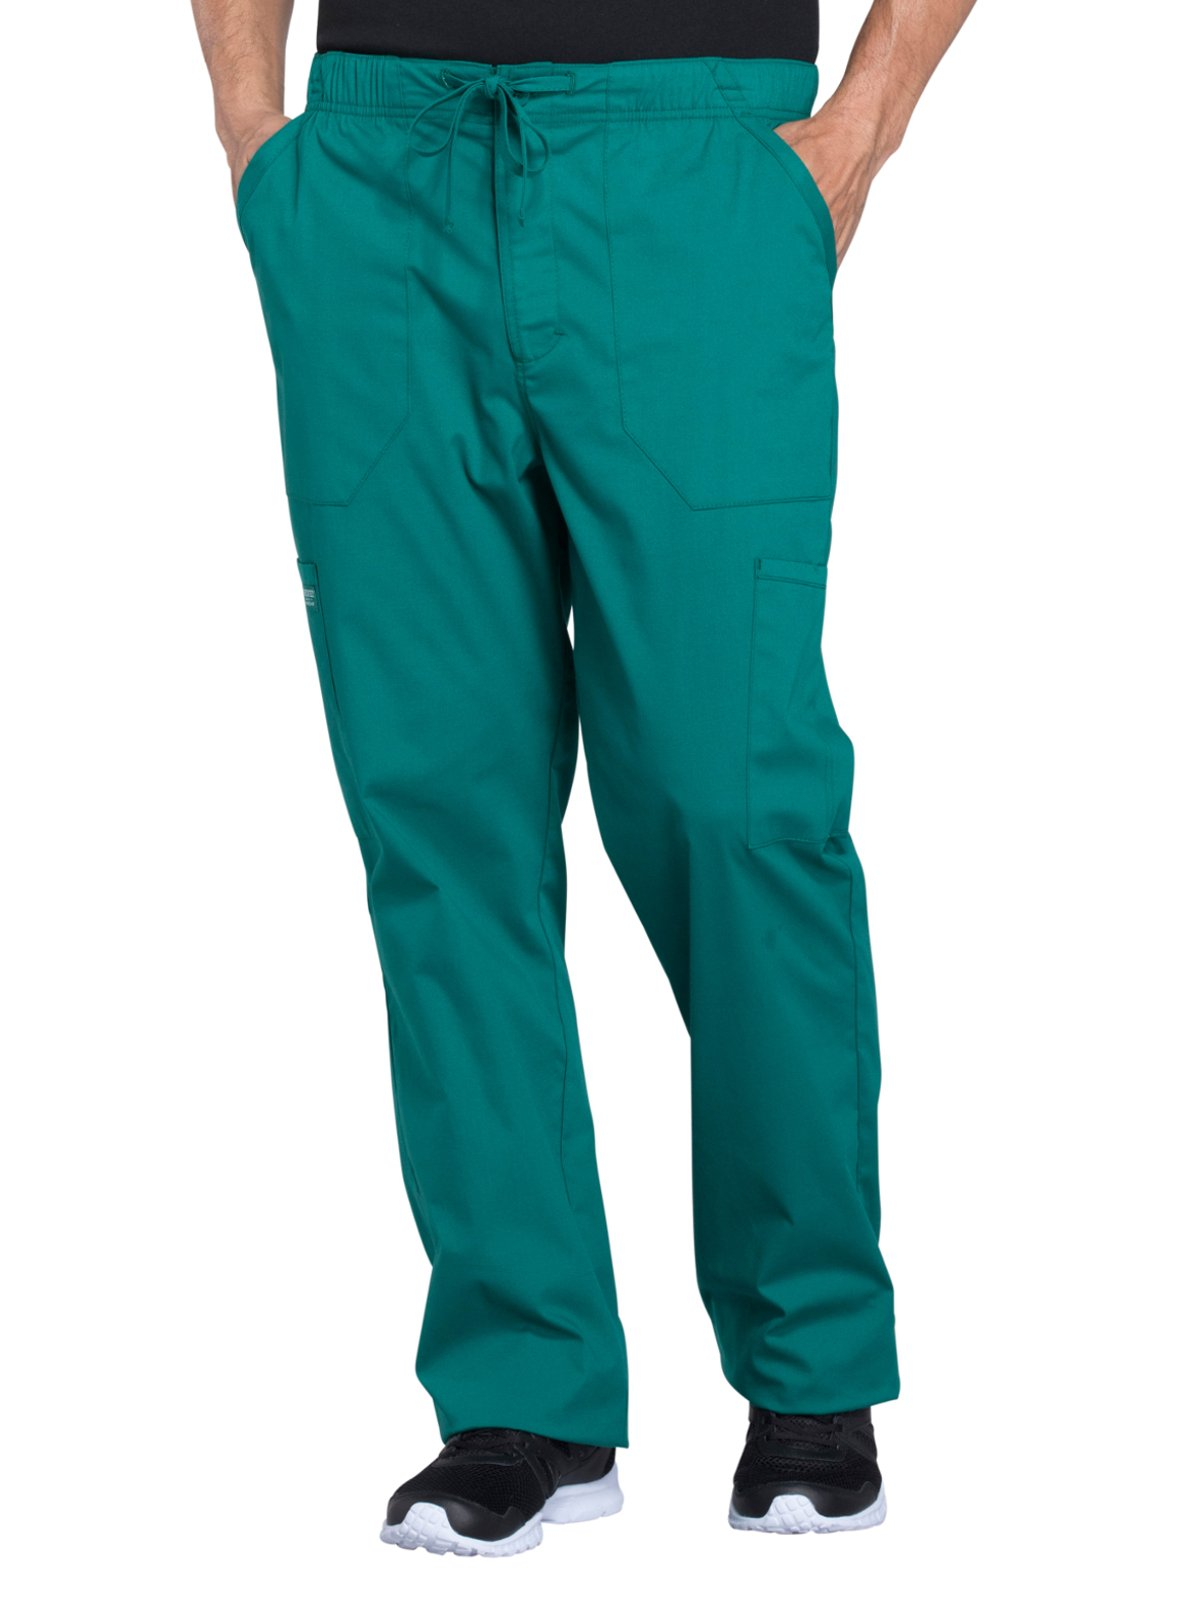 Cherokee Professionals Workwear Men's Tapered Leg Zip Fly Drawstring Scrub Pant X-Large Tall Hunter Green